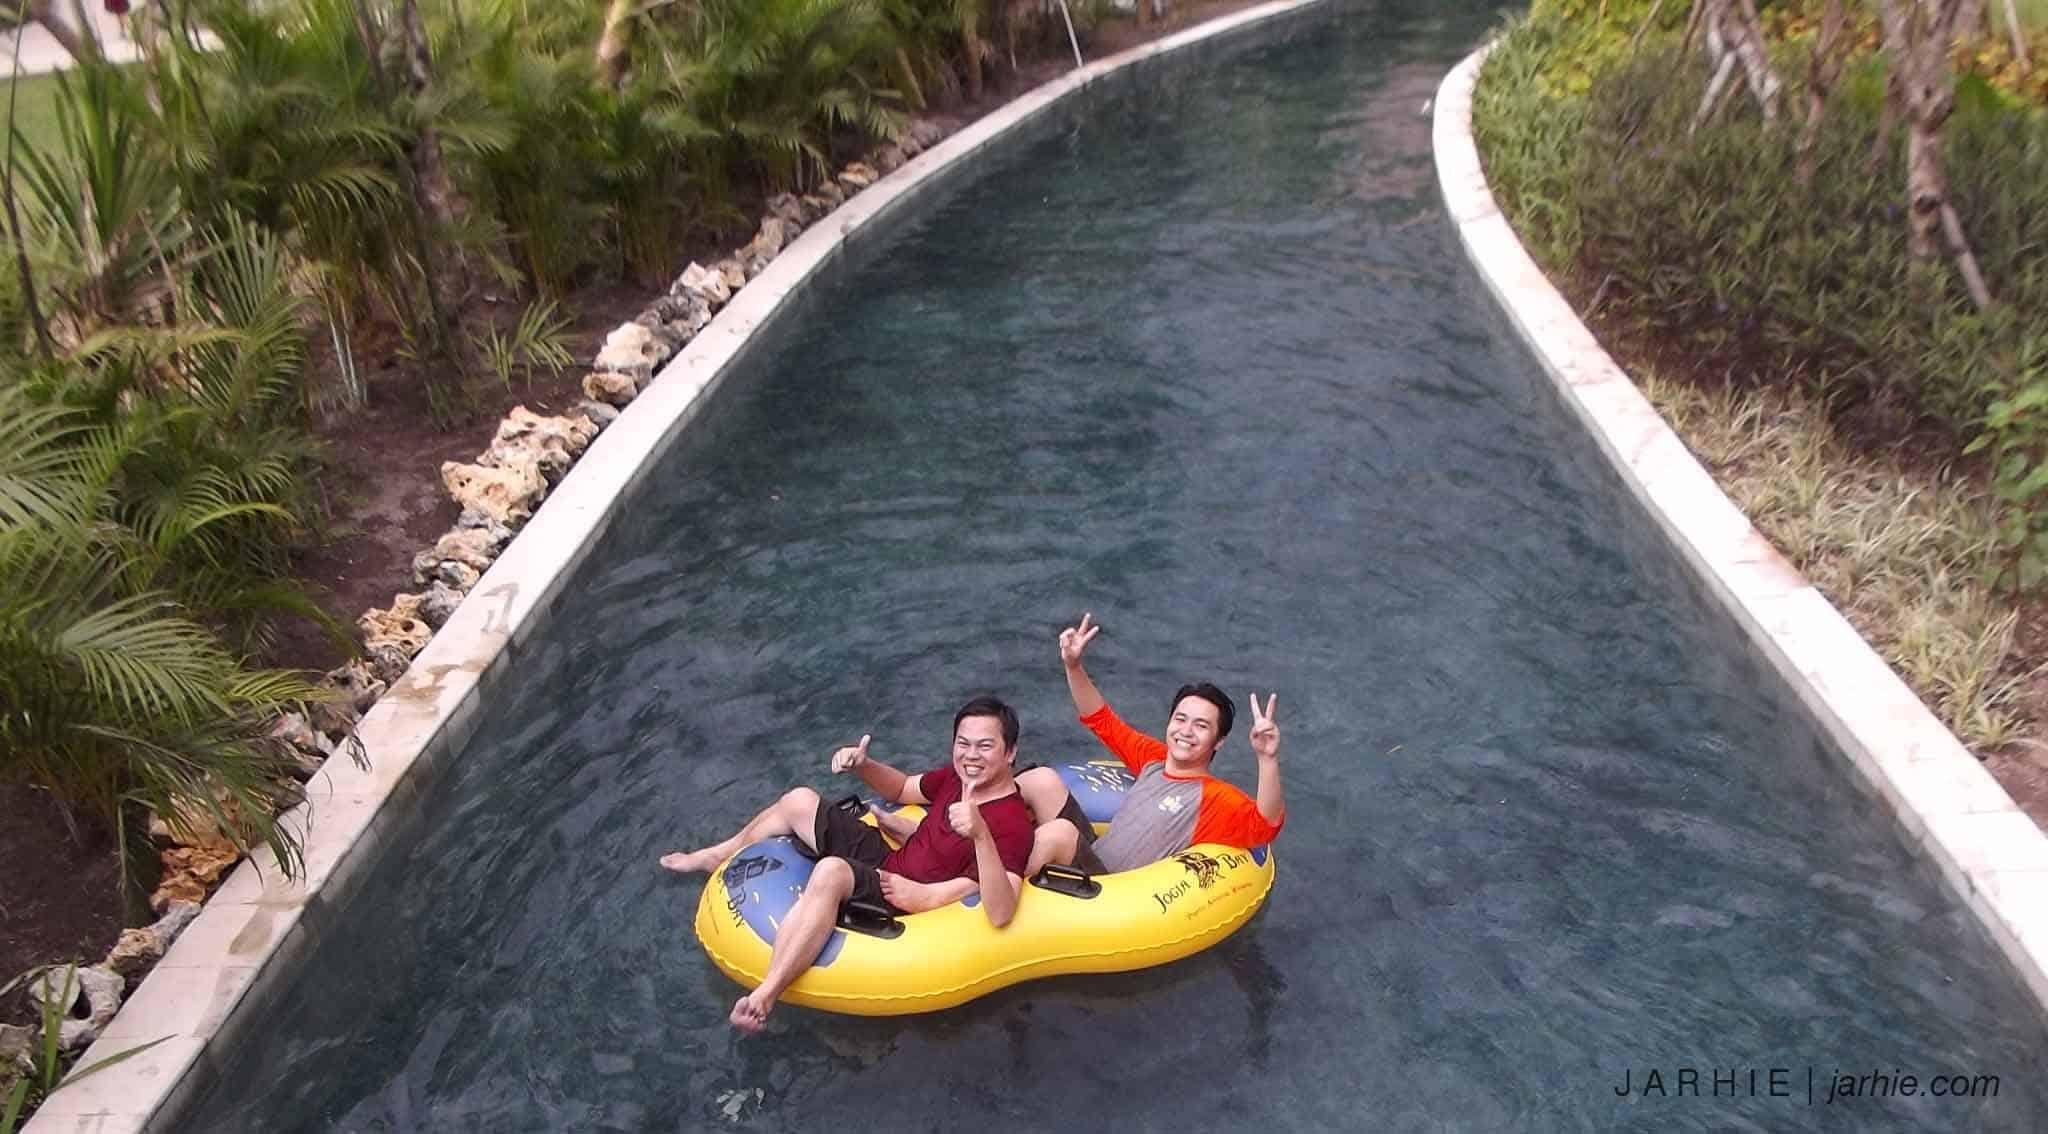 +20 Obyek Wisata Jogja 2018 - Wisata Alam Jawa